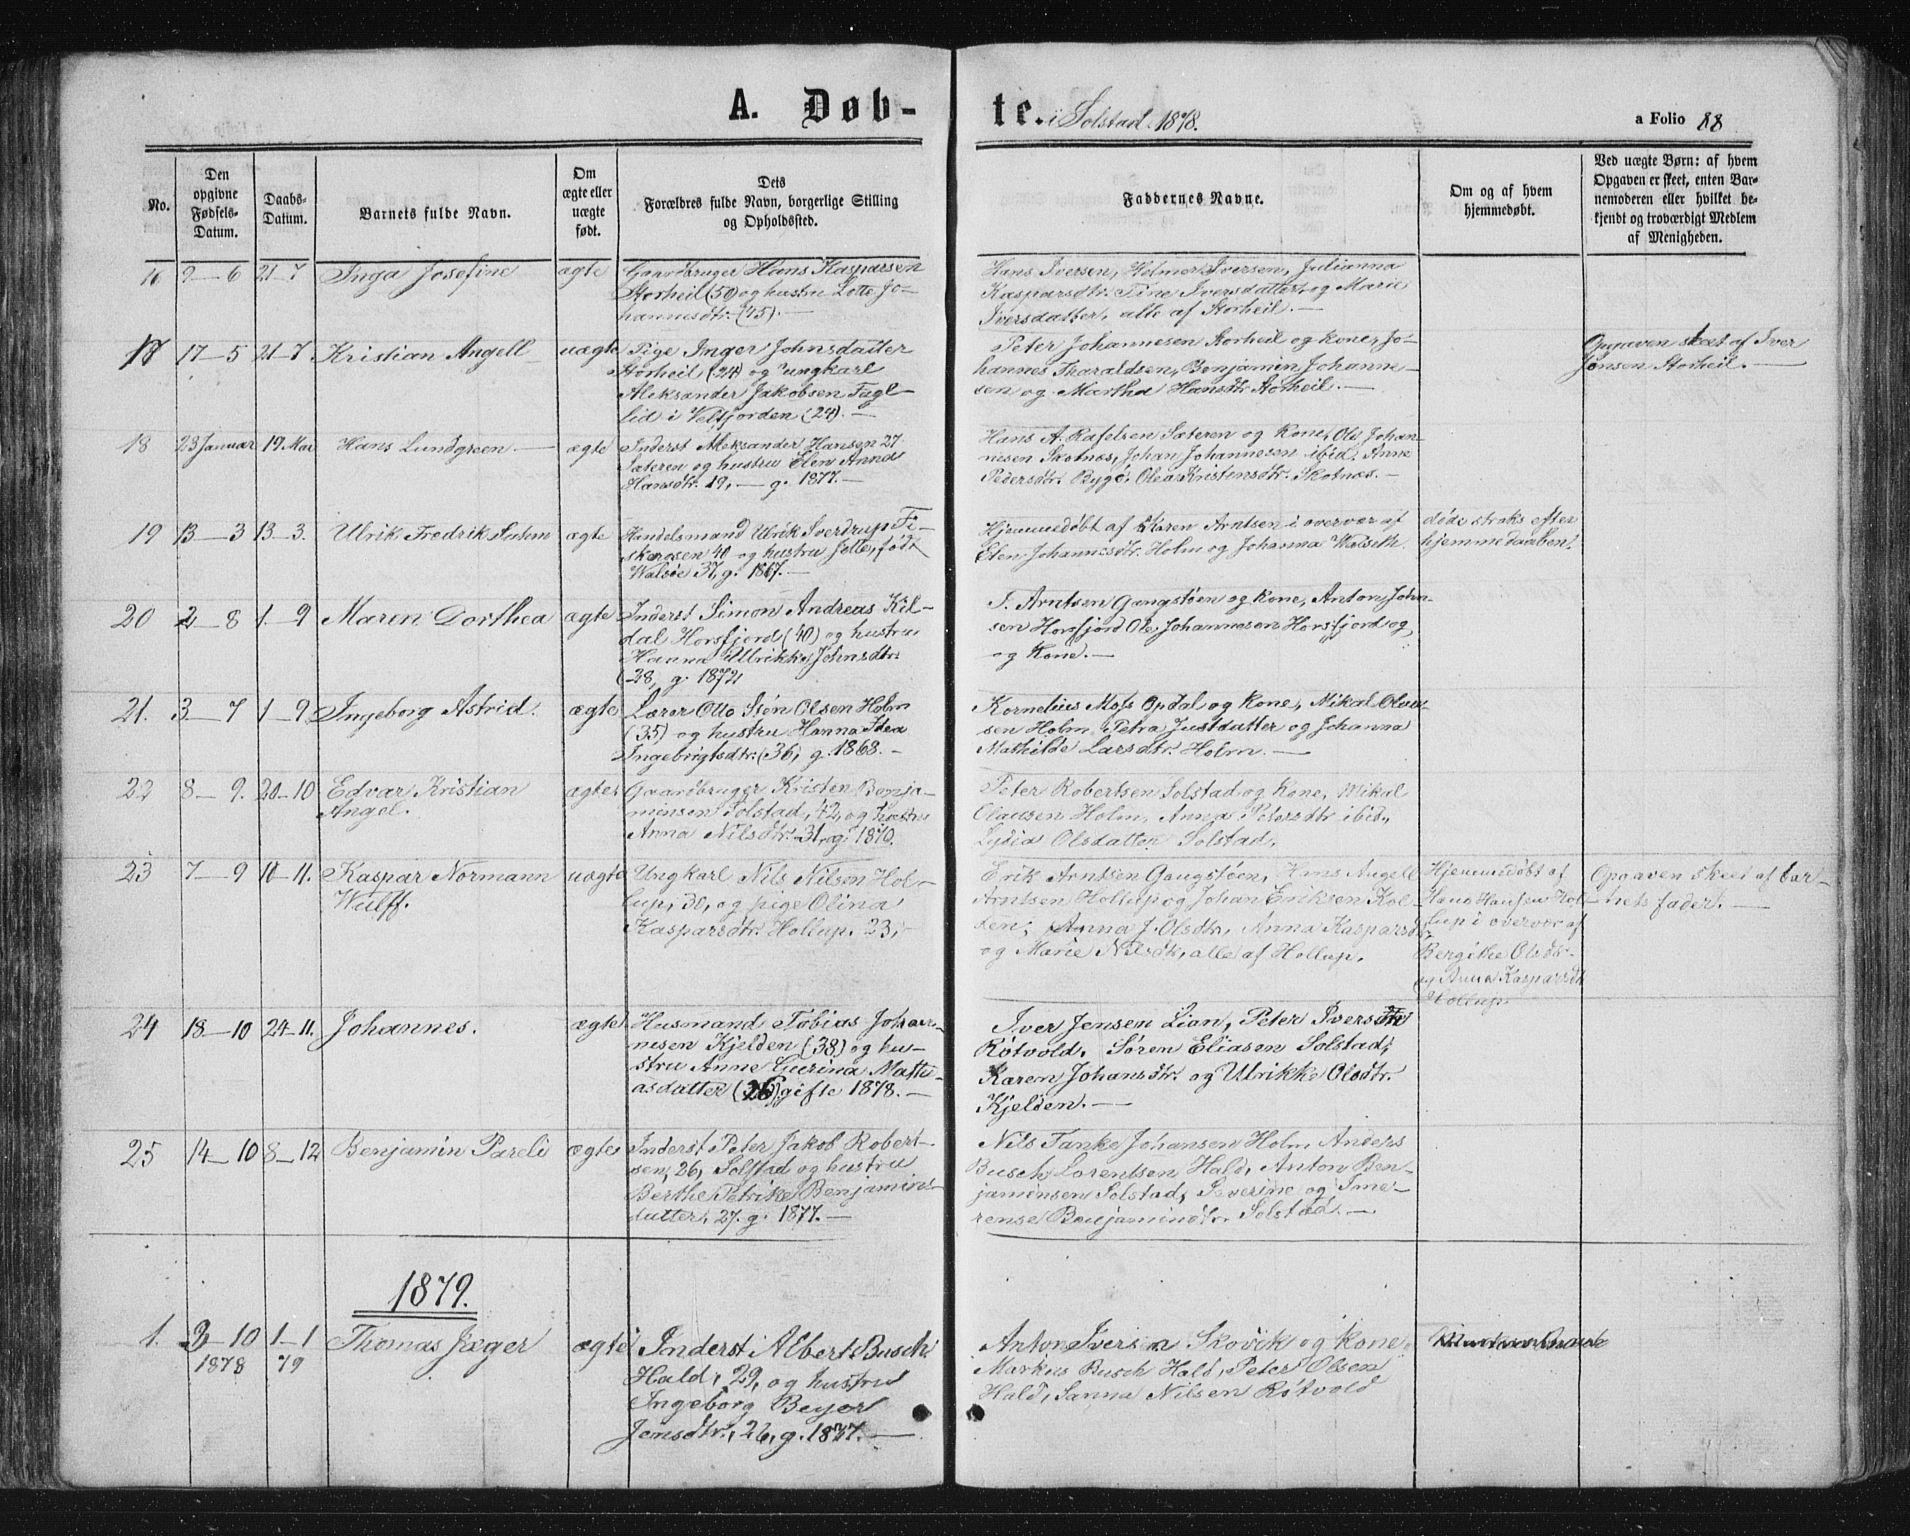 SAT, Ministerialprotokoller, klokkerbøker og fødselsregistre - Nordland, 810/L0159: Klokkerbok nr. 810C02 /2, 1863-1883, s. 88